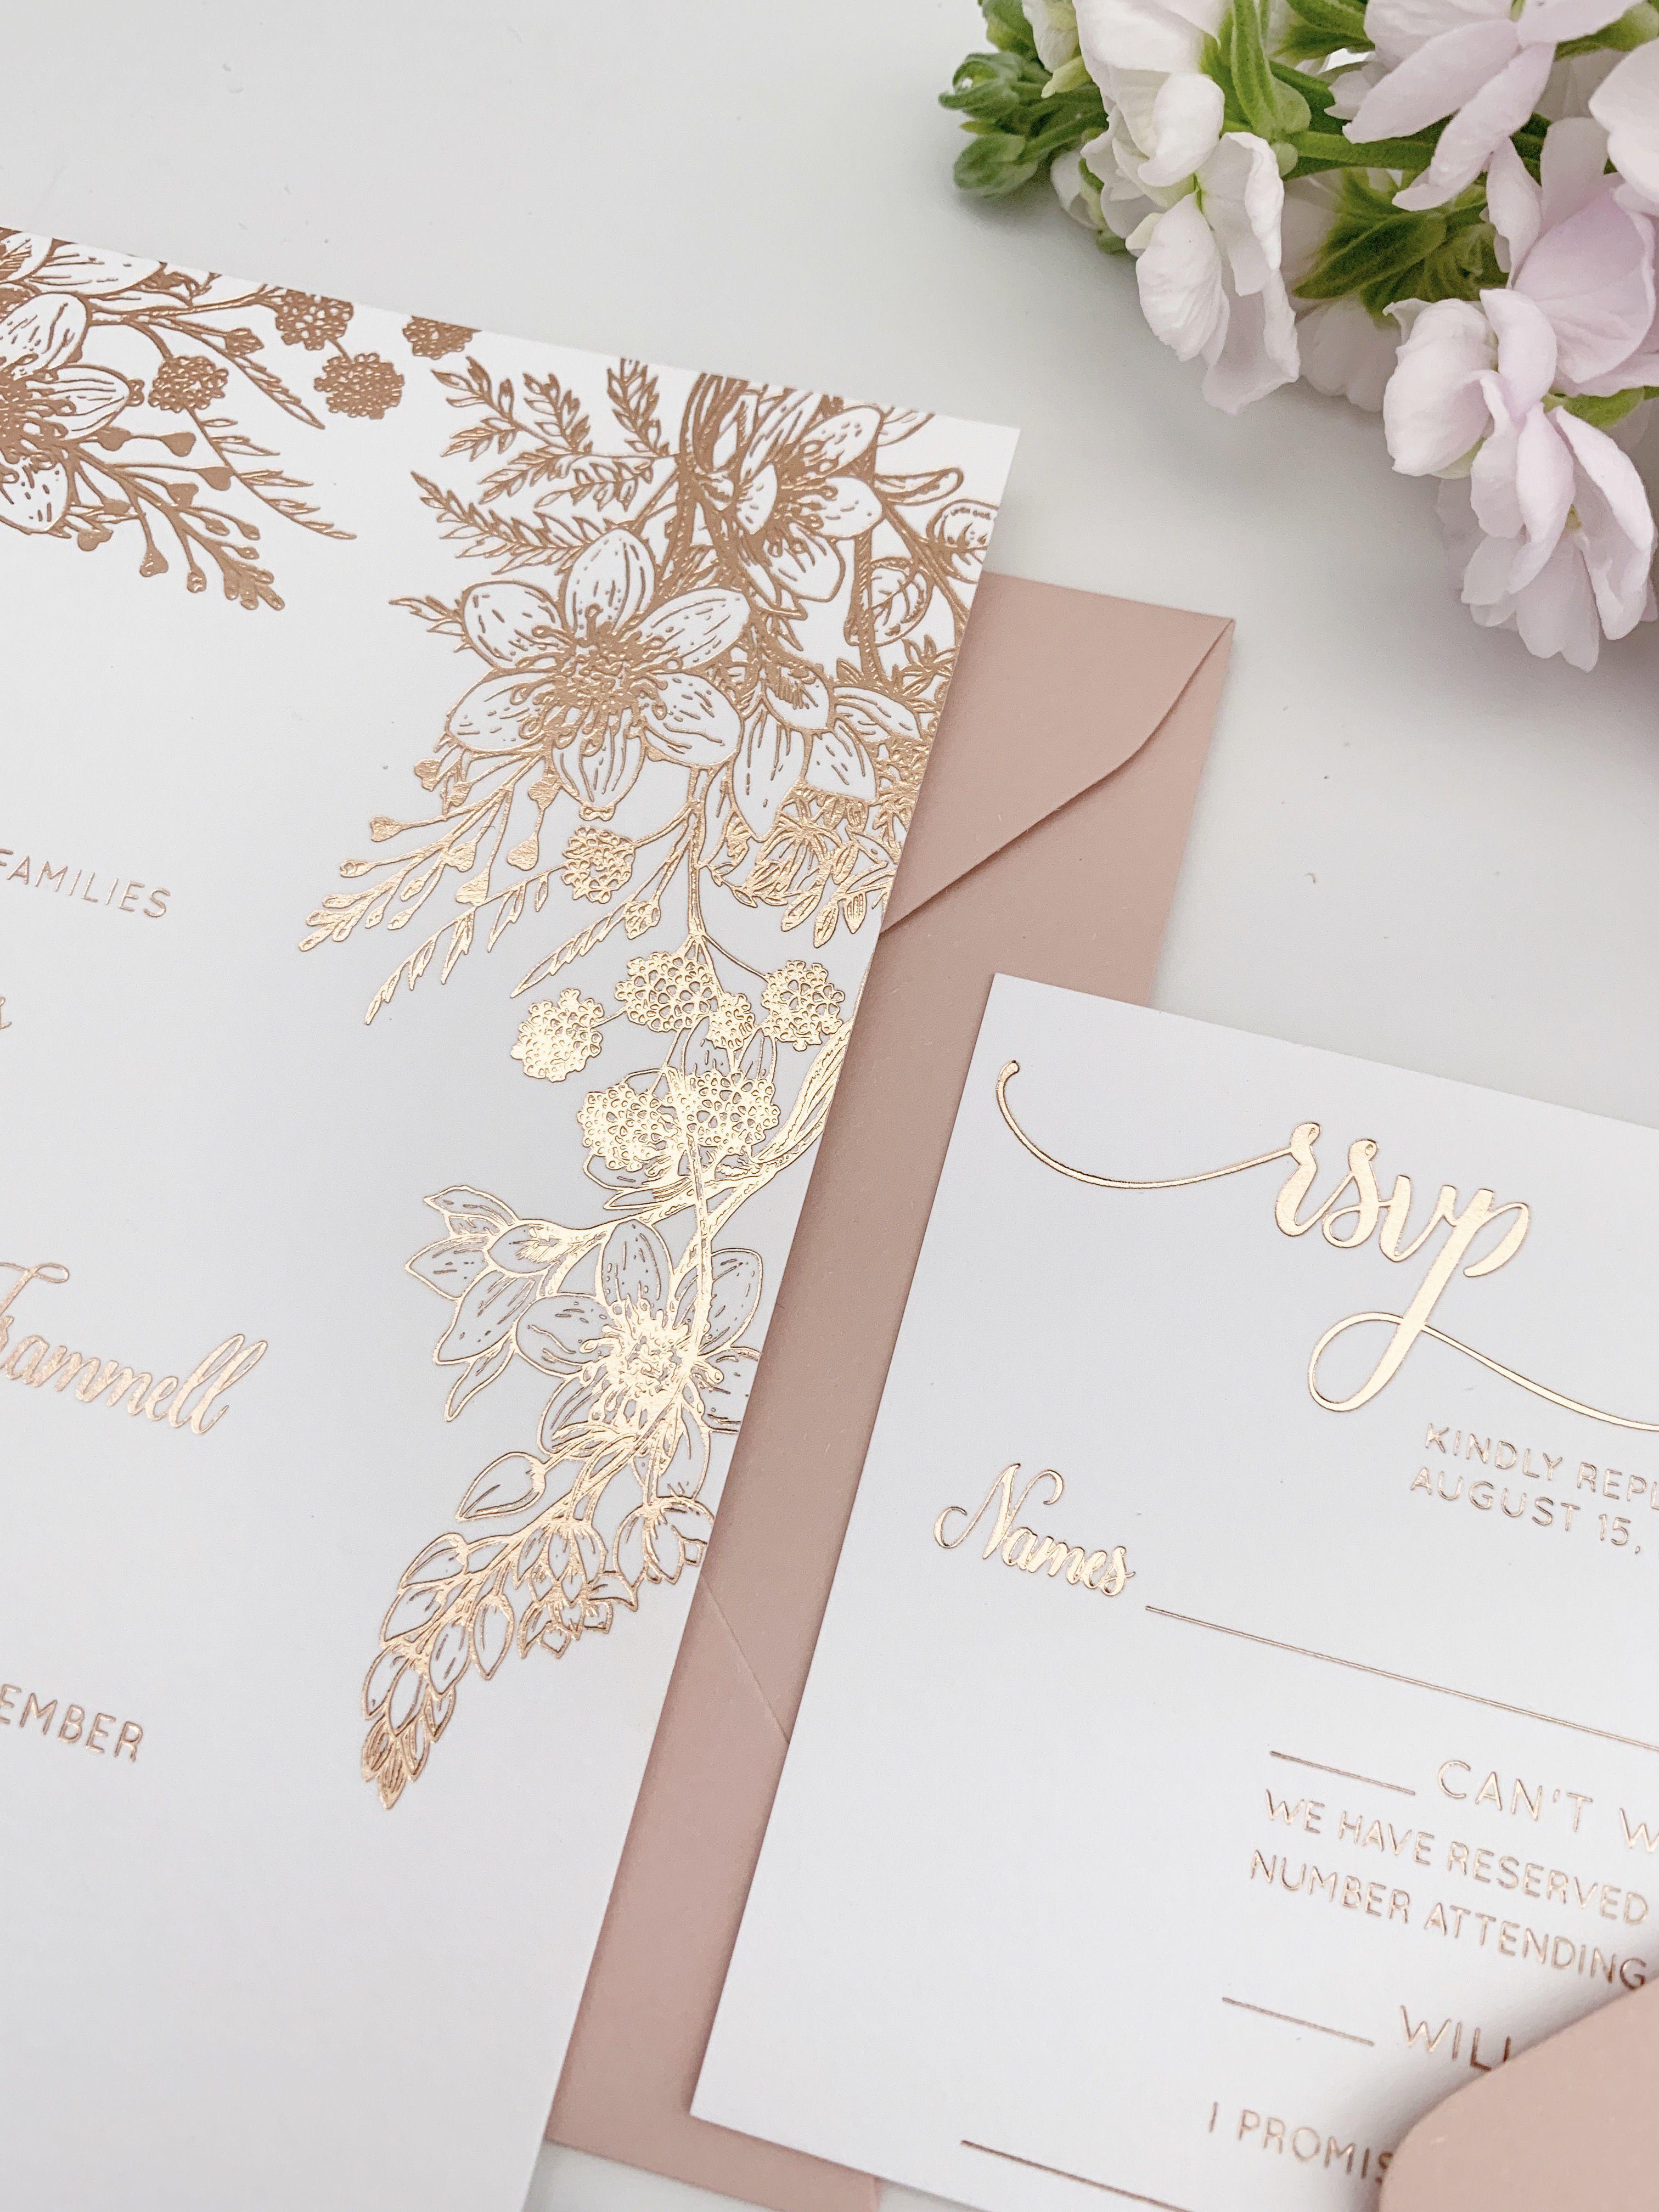 Rose Gold Wedding Invitations With Metallic Foil For A Romantic Glam Feel Com Foil Wedding Invitations Pink Wedding Invitations Rose Gold Wedding Invitations